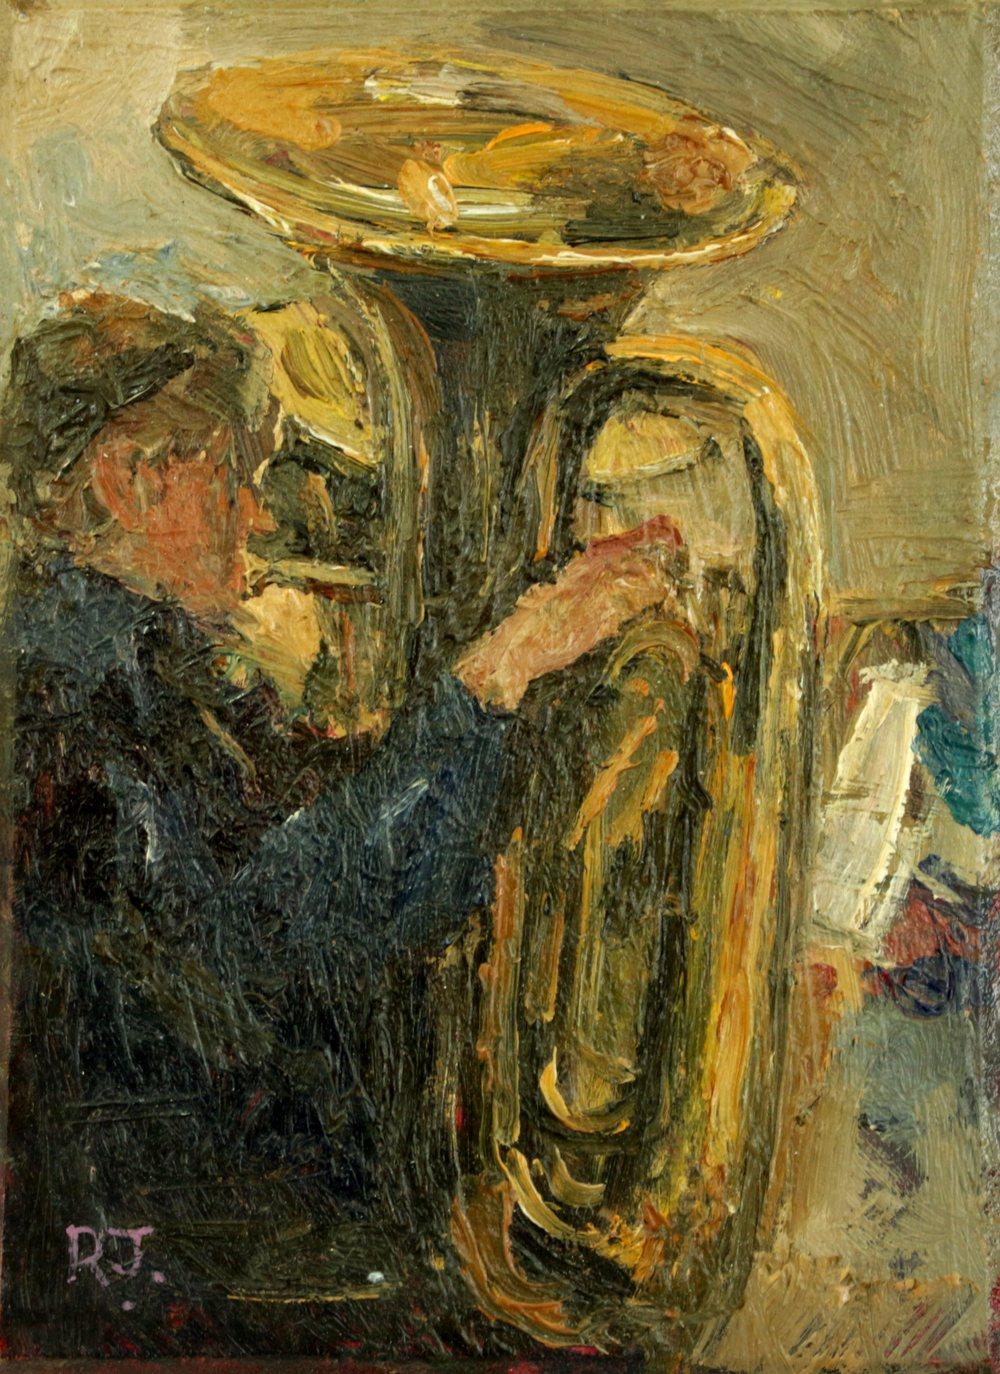 102. brass band